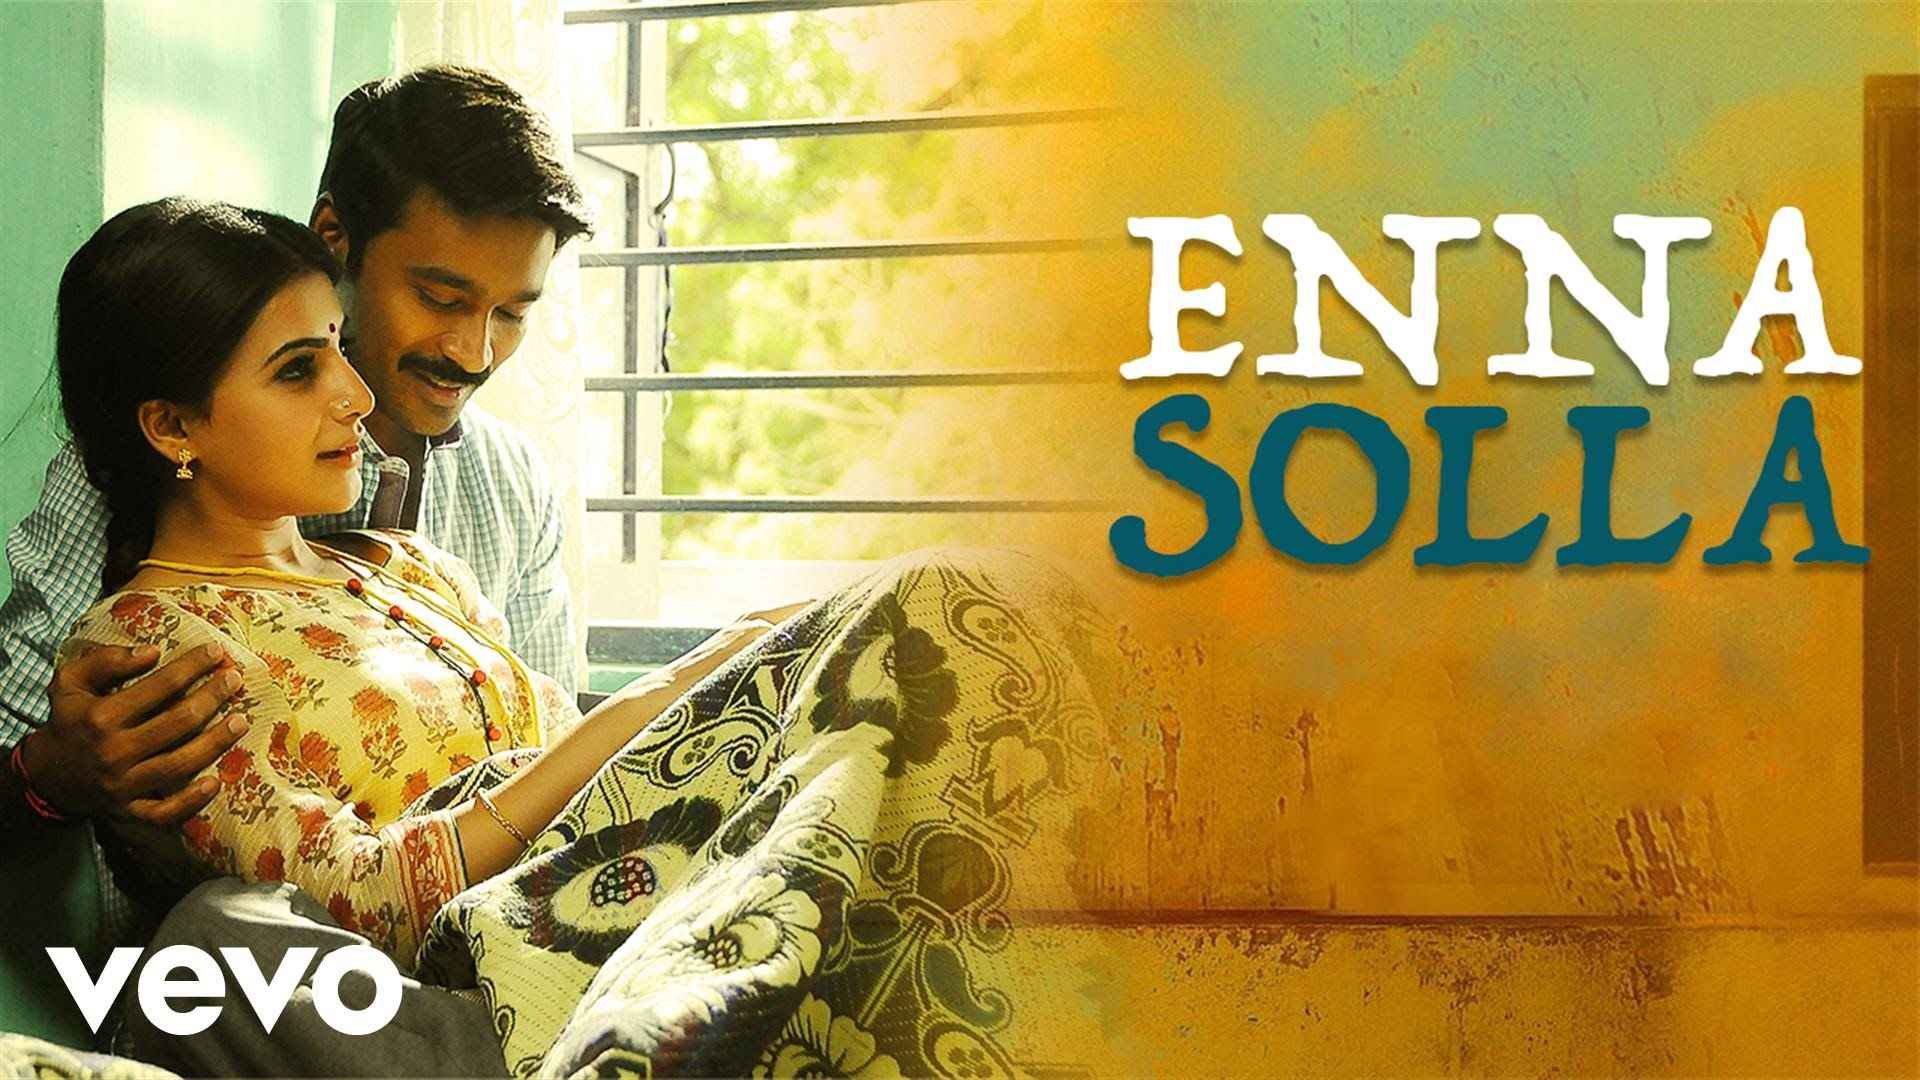 Thangamagan Enna Solla Lyric Anirudh Ravichander Dhanush Tamil Video Songs Anirudh Ravichander Soul Songs